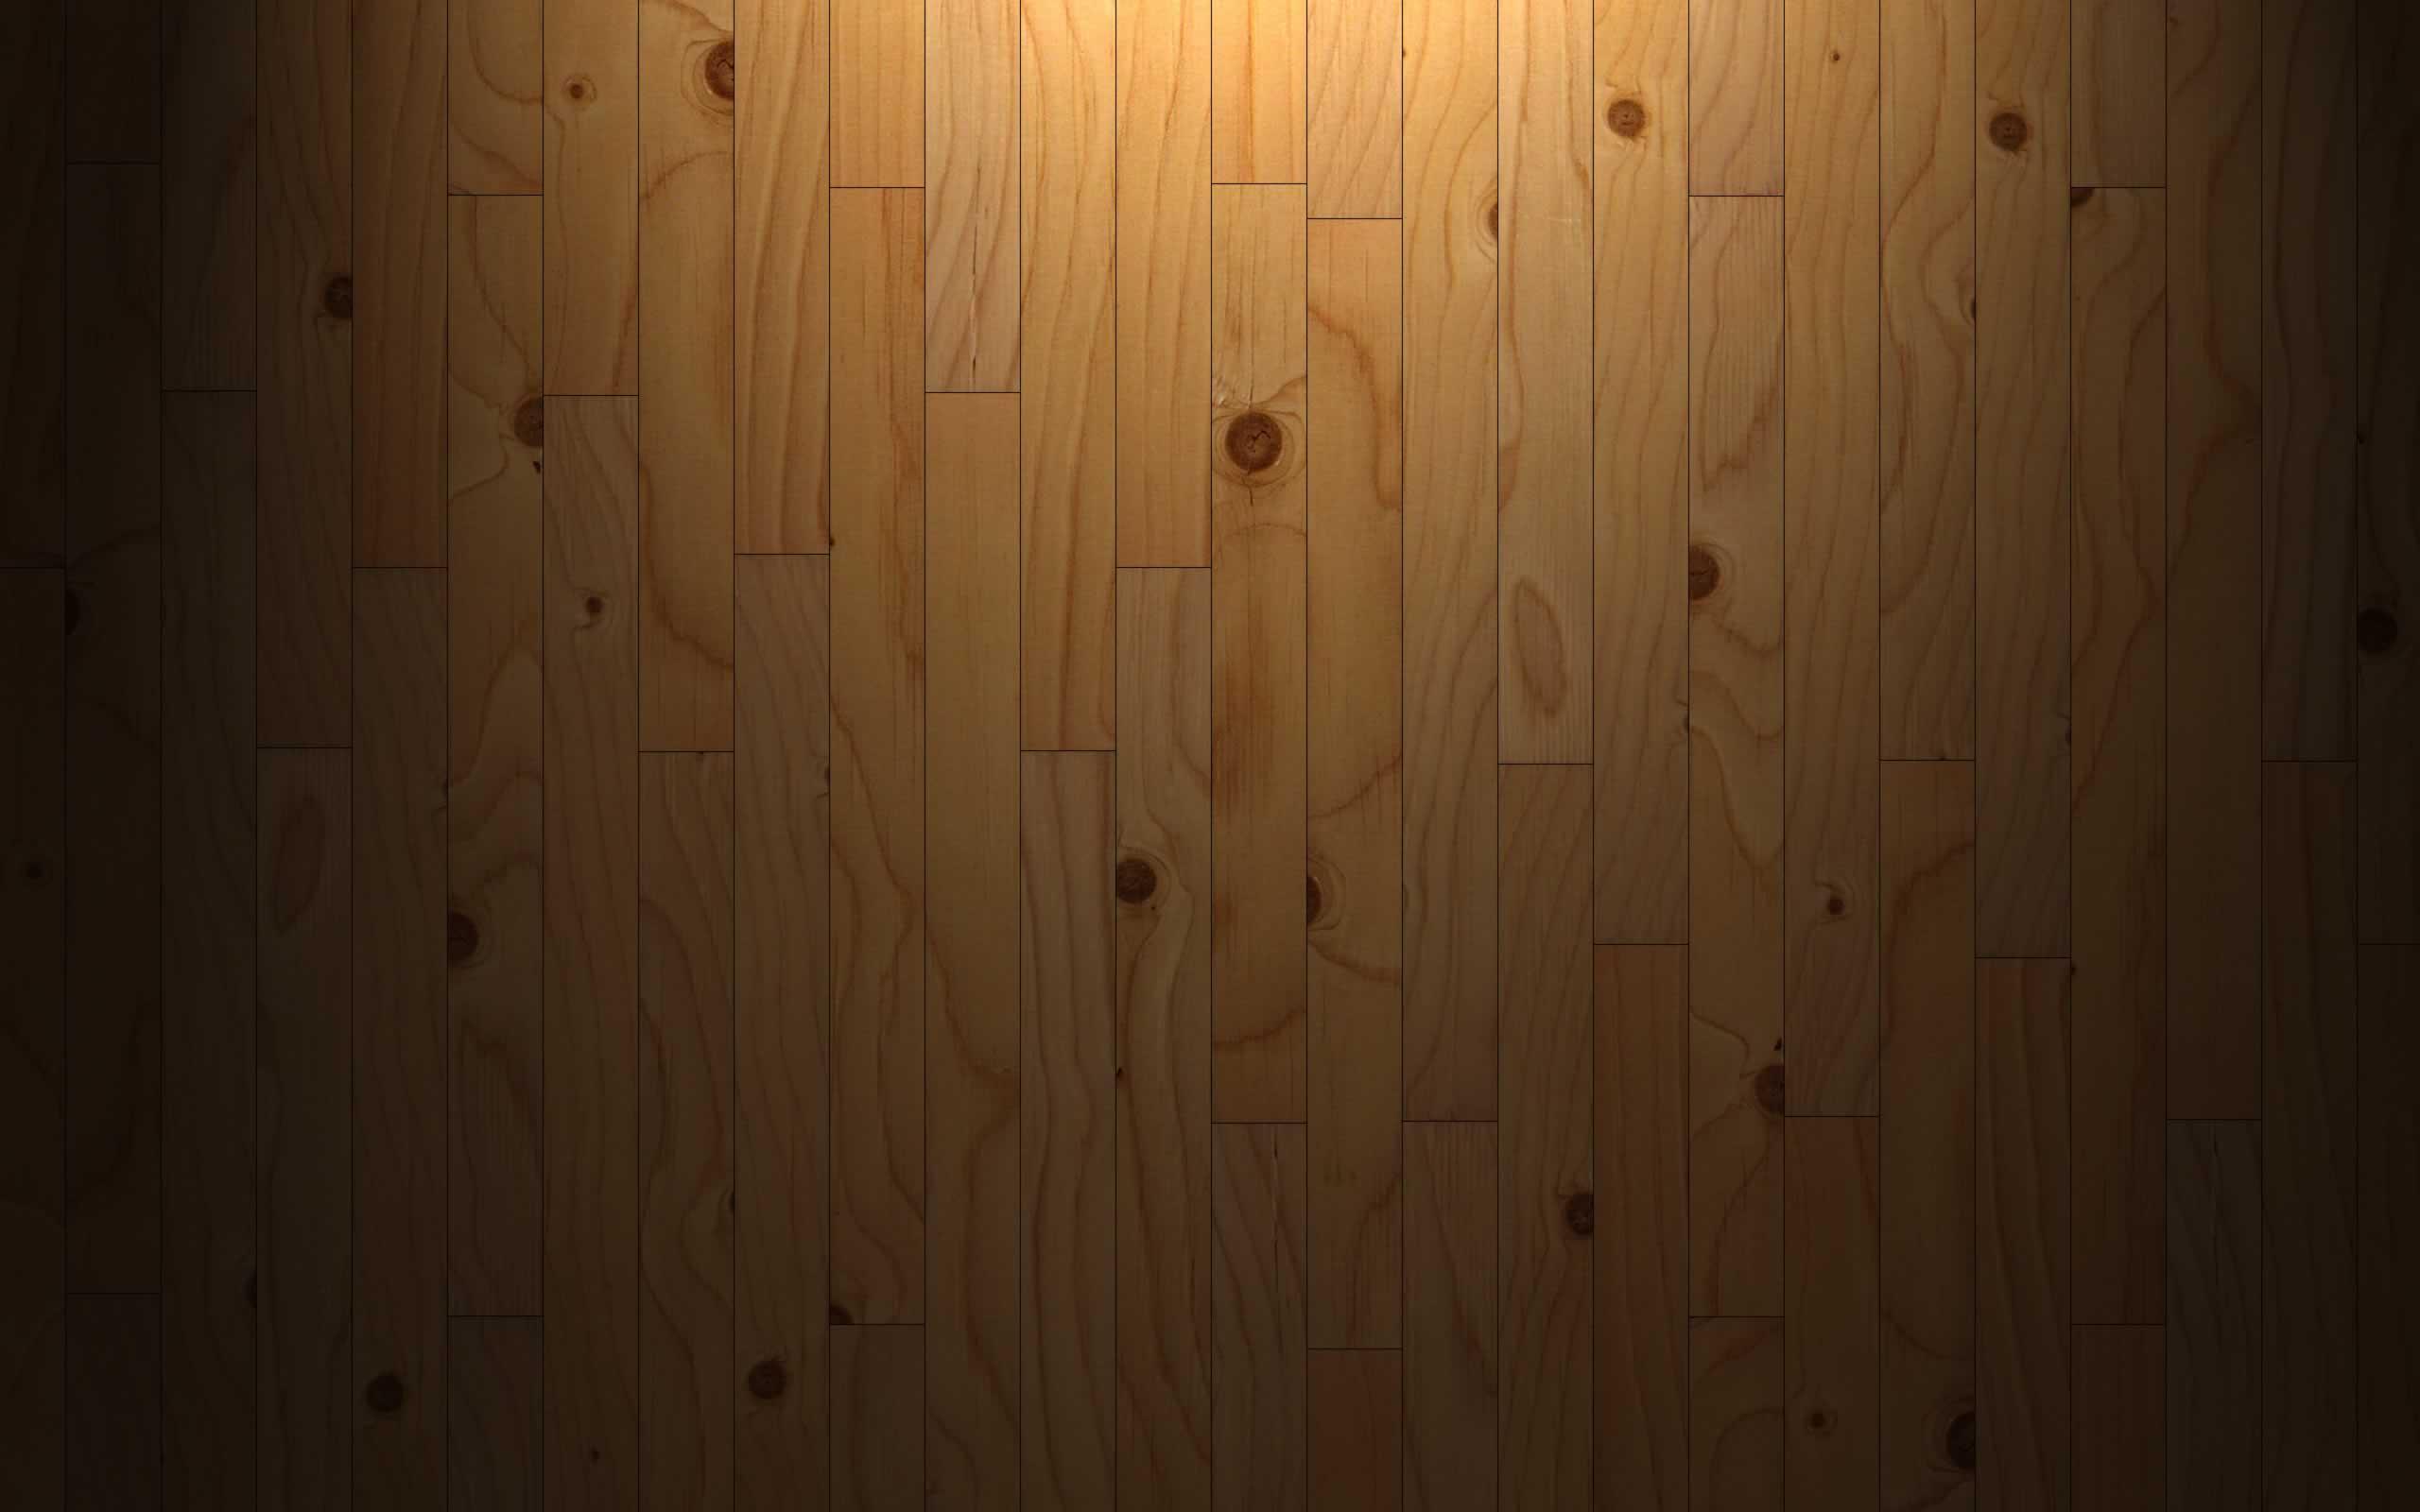 Plain Wood Backgrounds